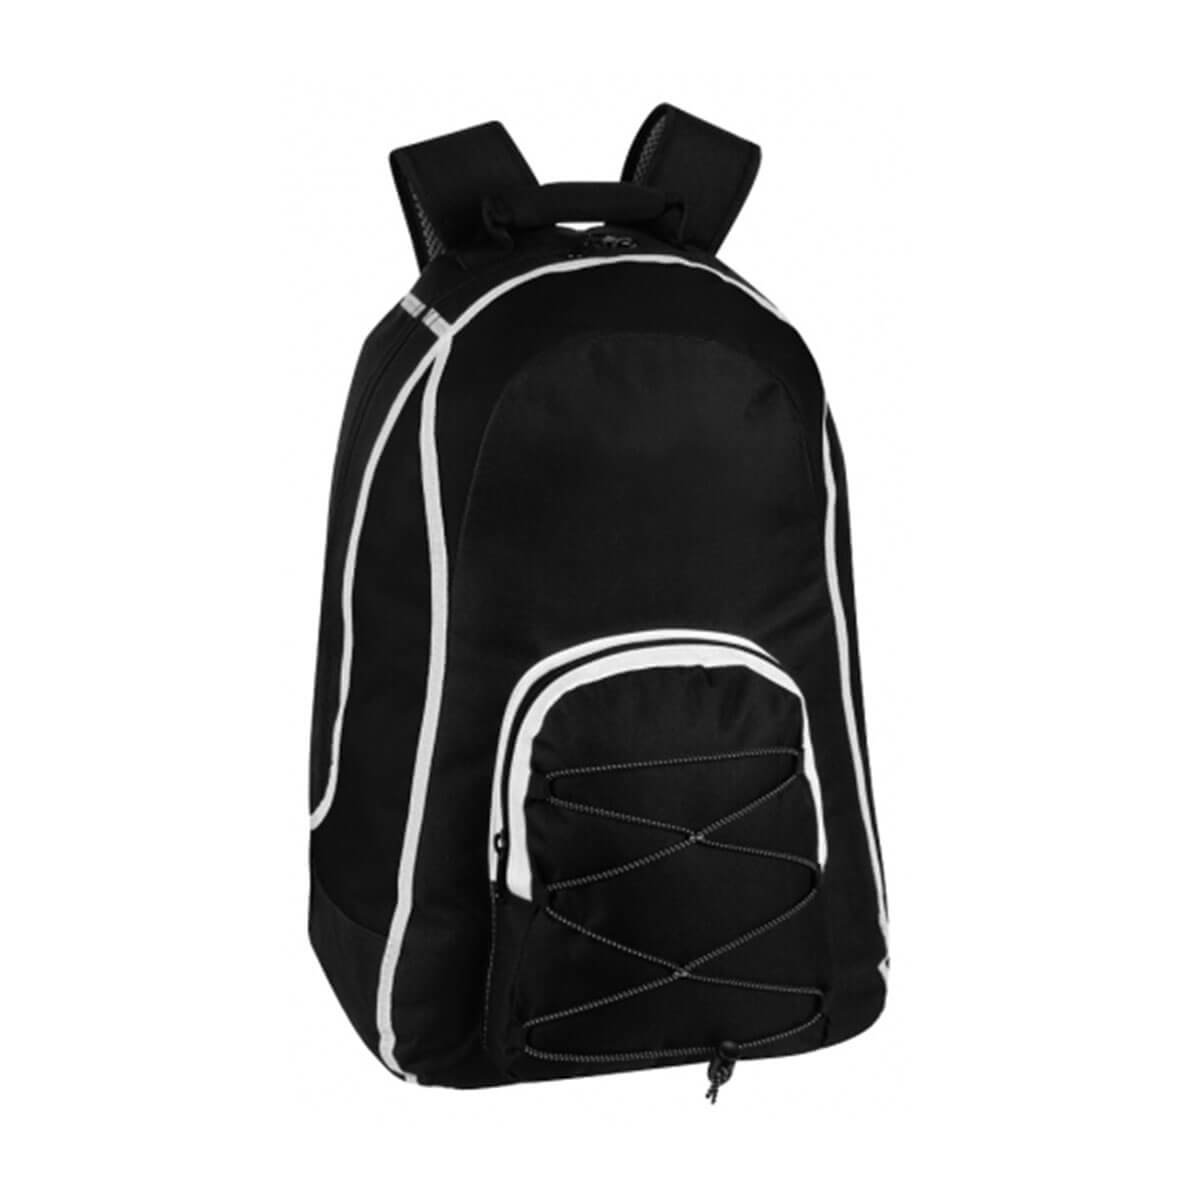 Virage Backpack-Black / White / Black